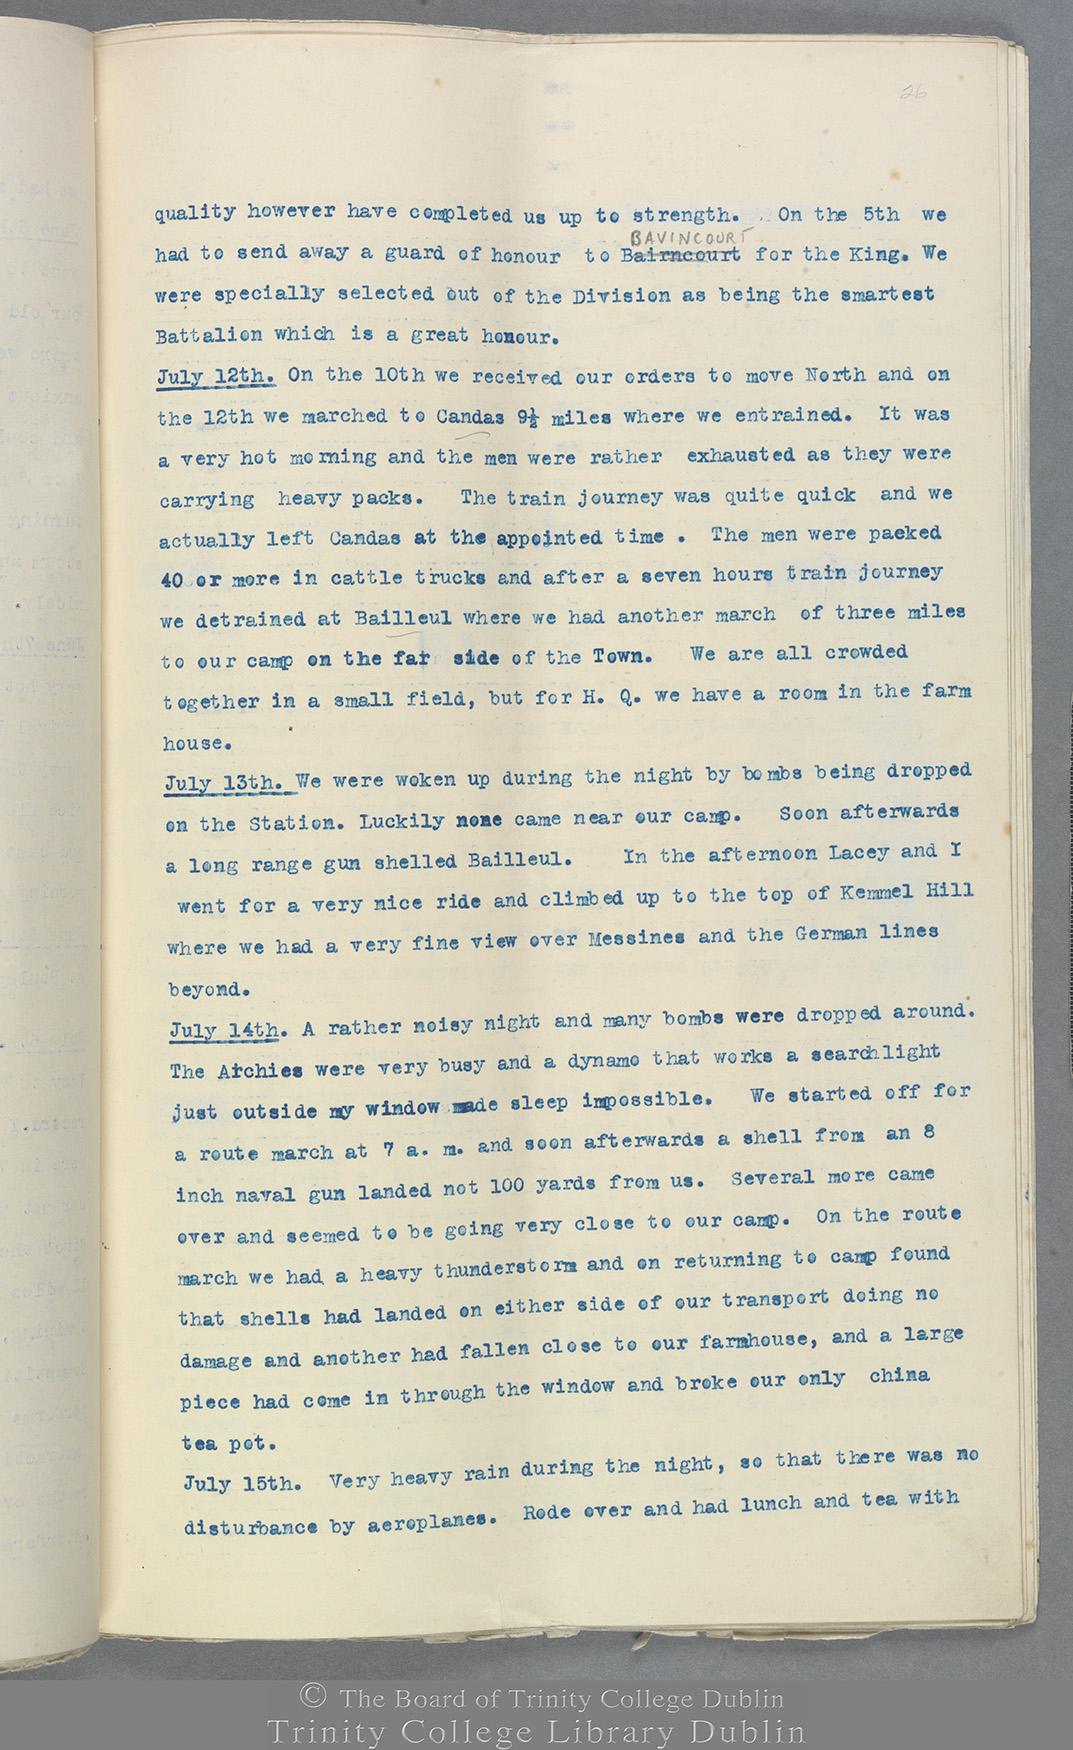 TCD MS 10822 folio 26 recto